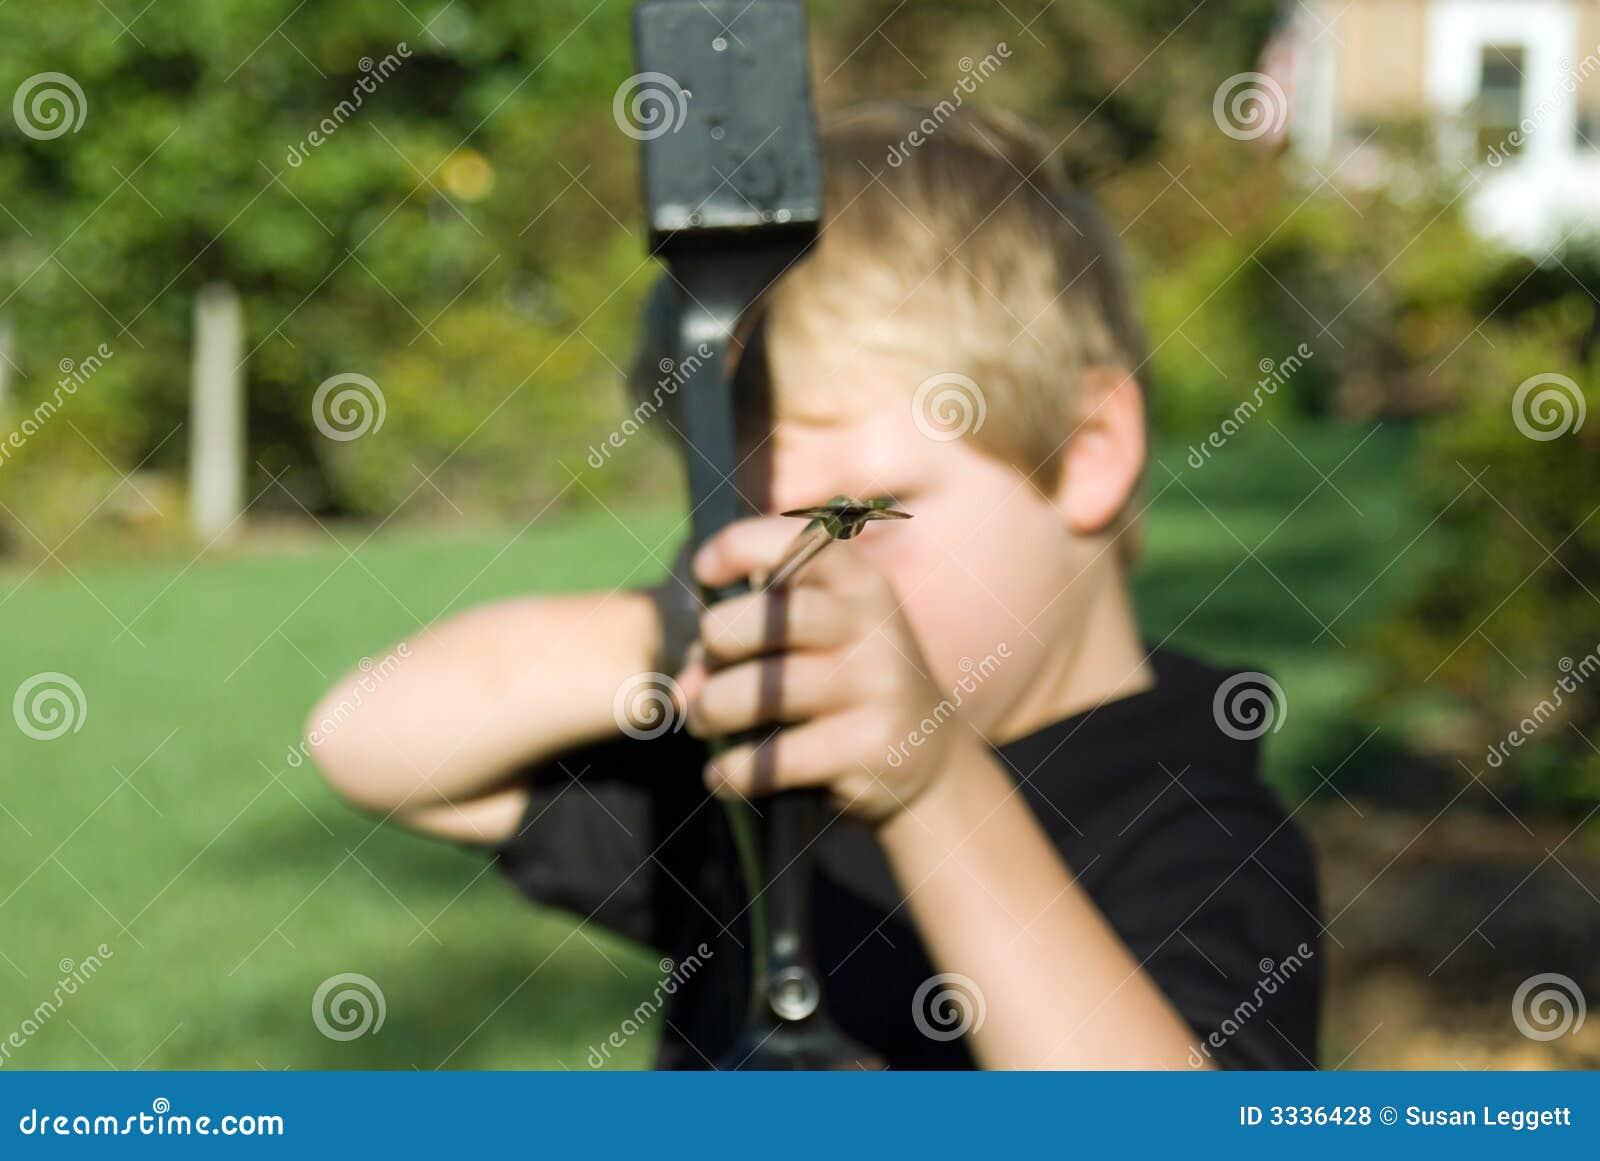 Boy With Bow and Arrow